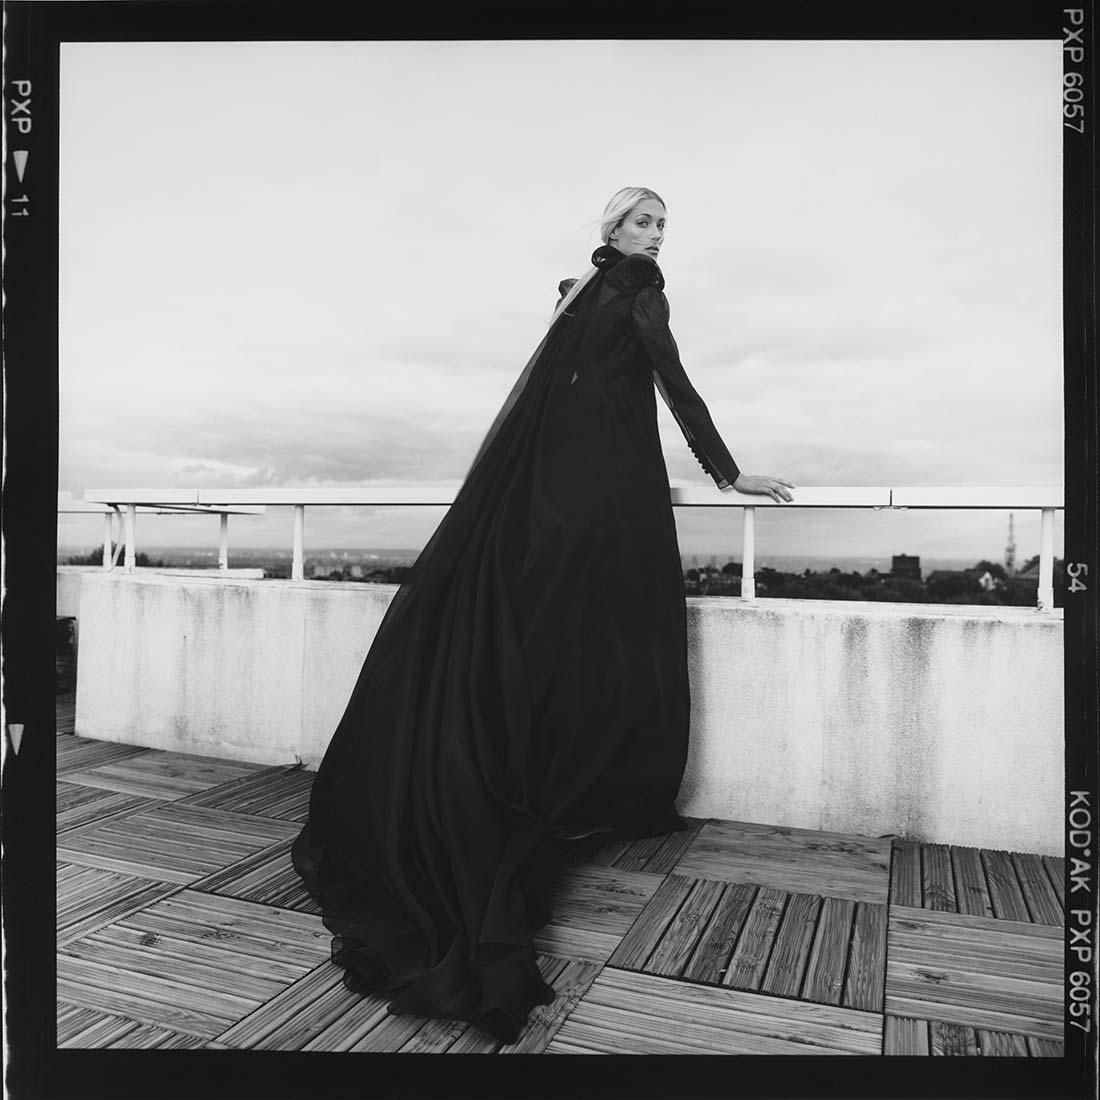 Heidi Wichlinski, Neil Cunningham No.4, 1999